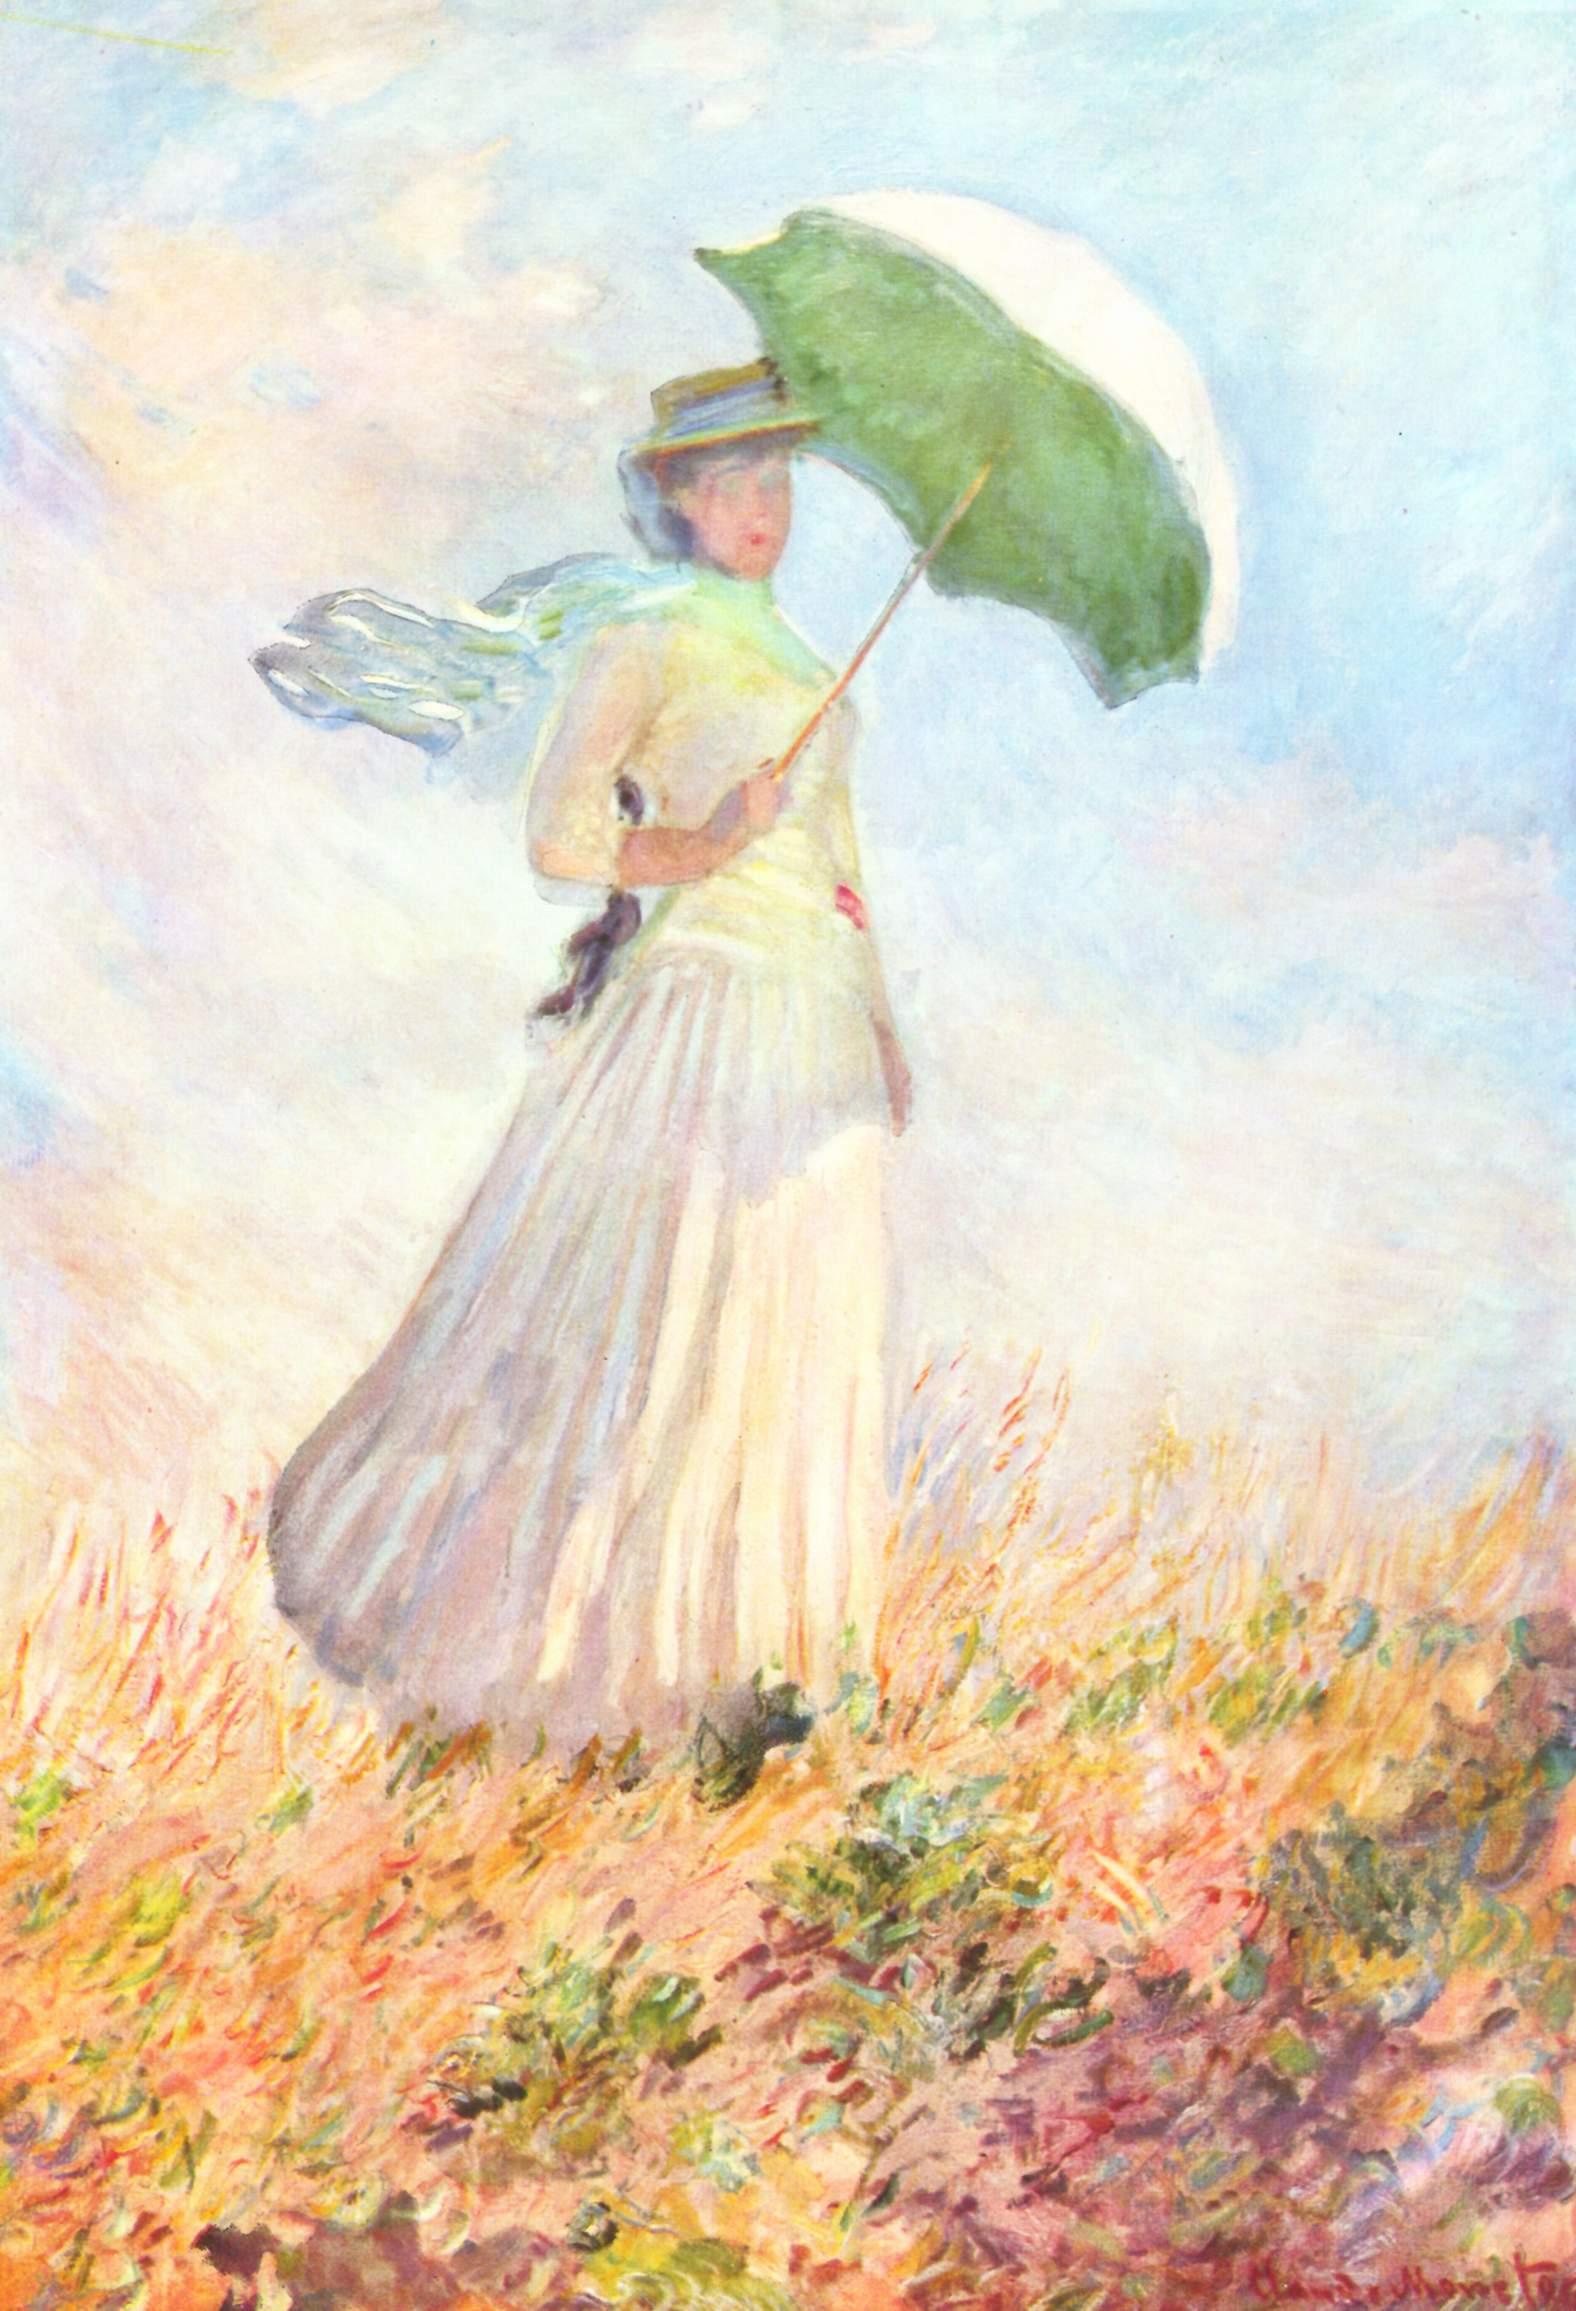 <img200*0:http://upload.wikimedia.org/wikipedia/commons/f/fb/Claude_Monet_012.jpg>